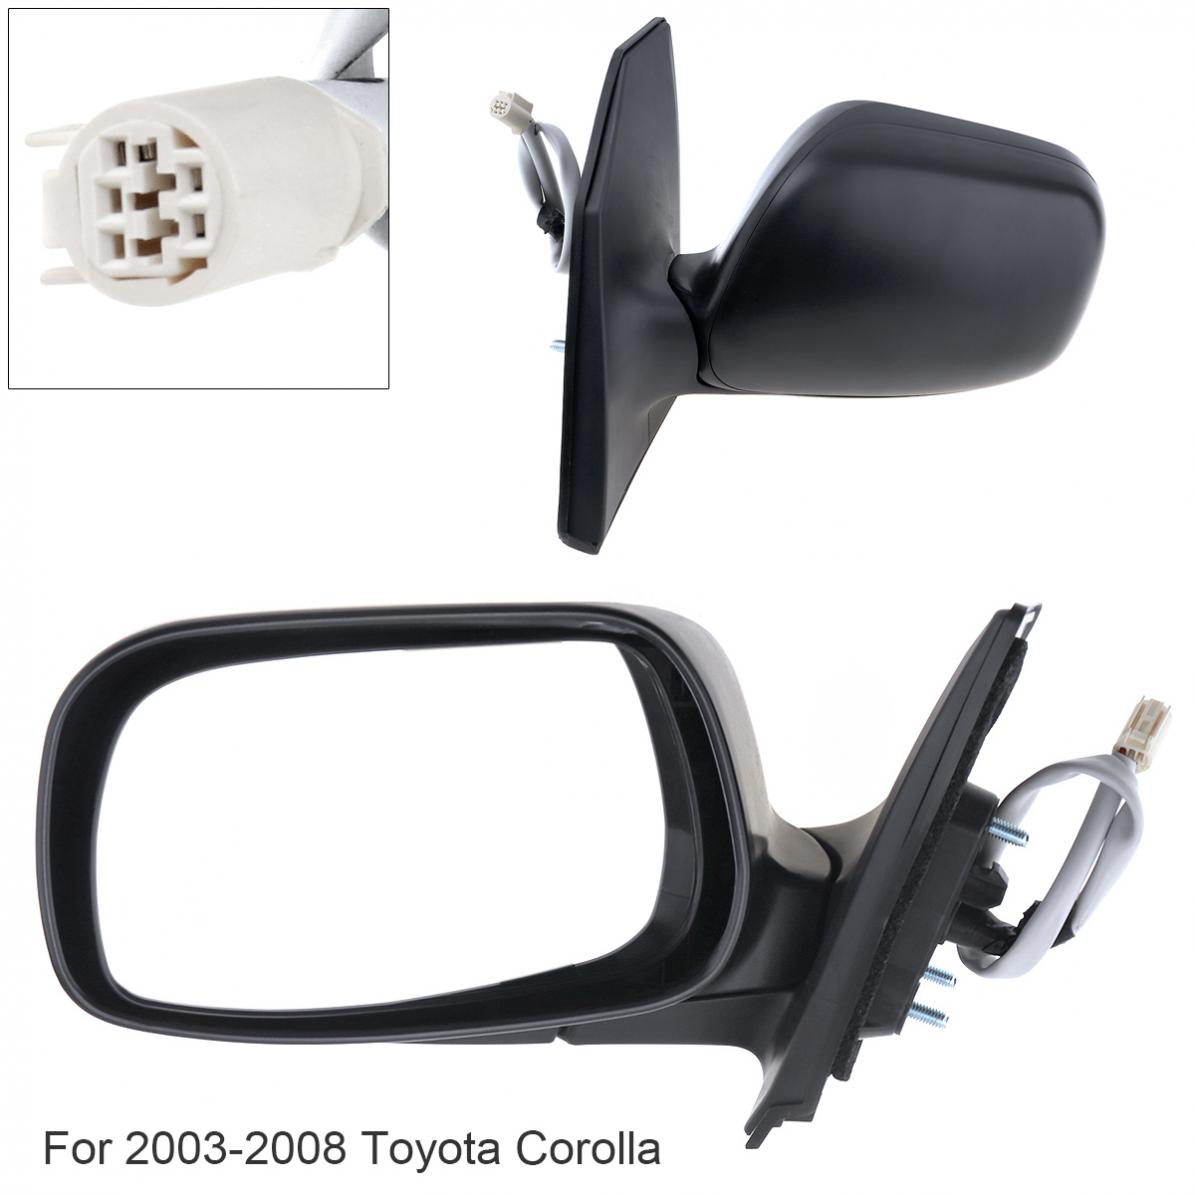 Non Folding Waterproof Car Left Side Mirror Left Hand LH Mirror for 2003 2008 Toyota Corolla CE/LE/S/Sport/ XRS Sedan 4 Door